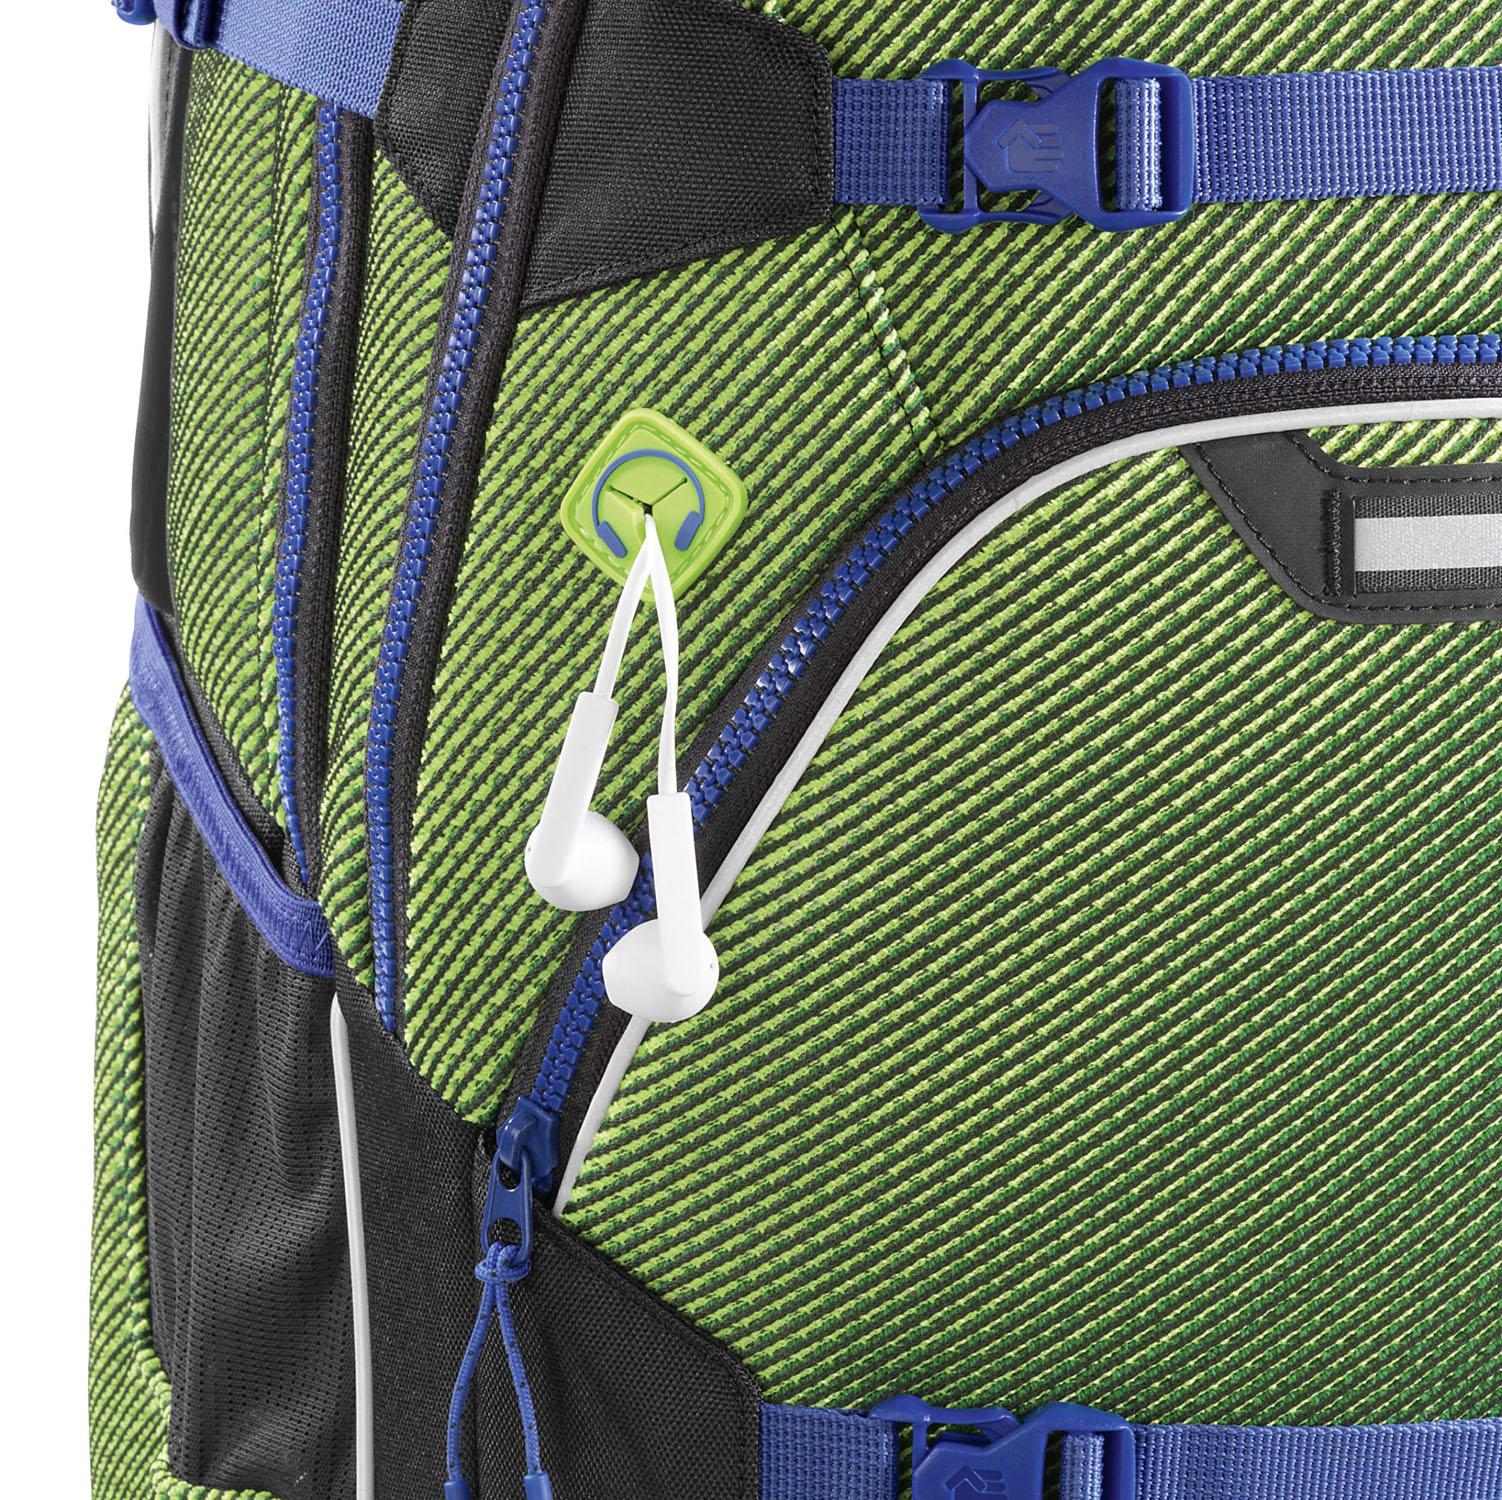 727a61054ae1f Zoom. Coocazoo Schulrucksäcke ScaleRale Rucksack MatchPatch  FreakaSneaka  Edition  Chameleon Green